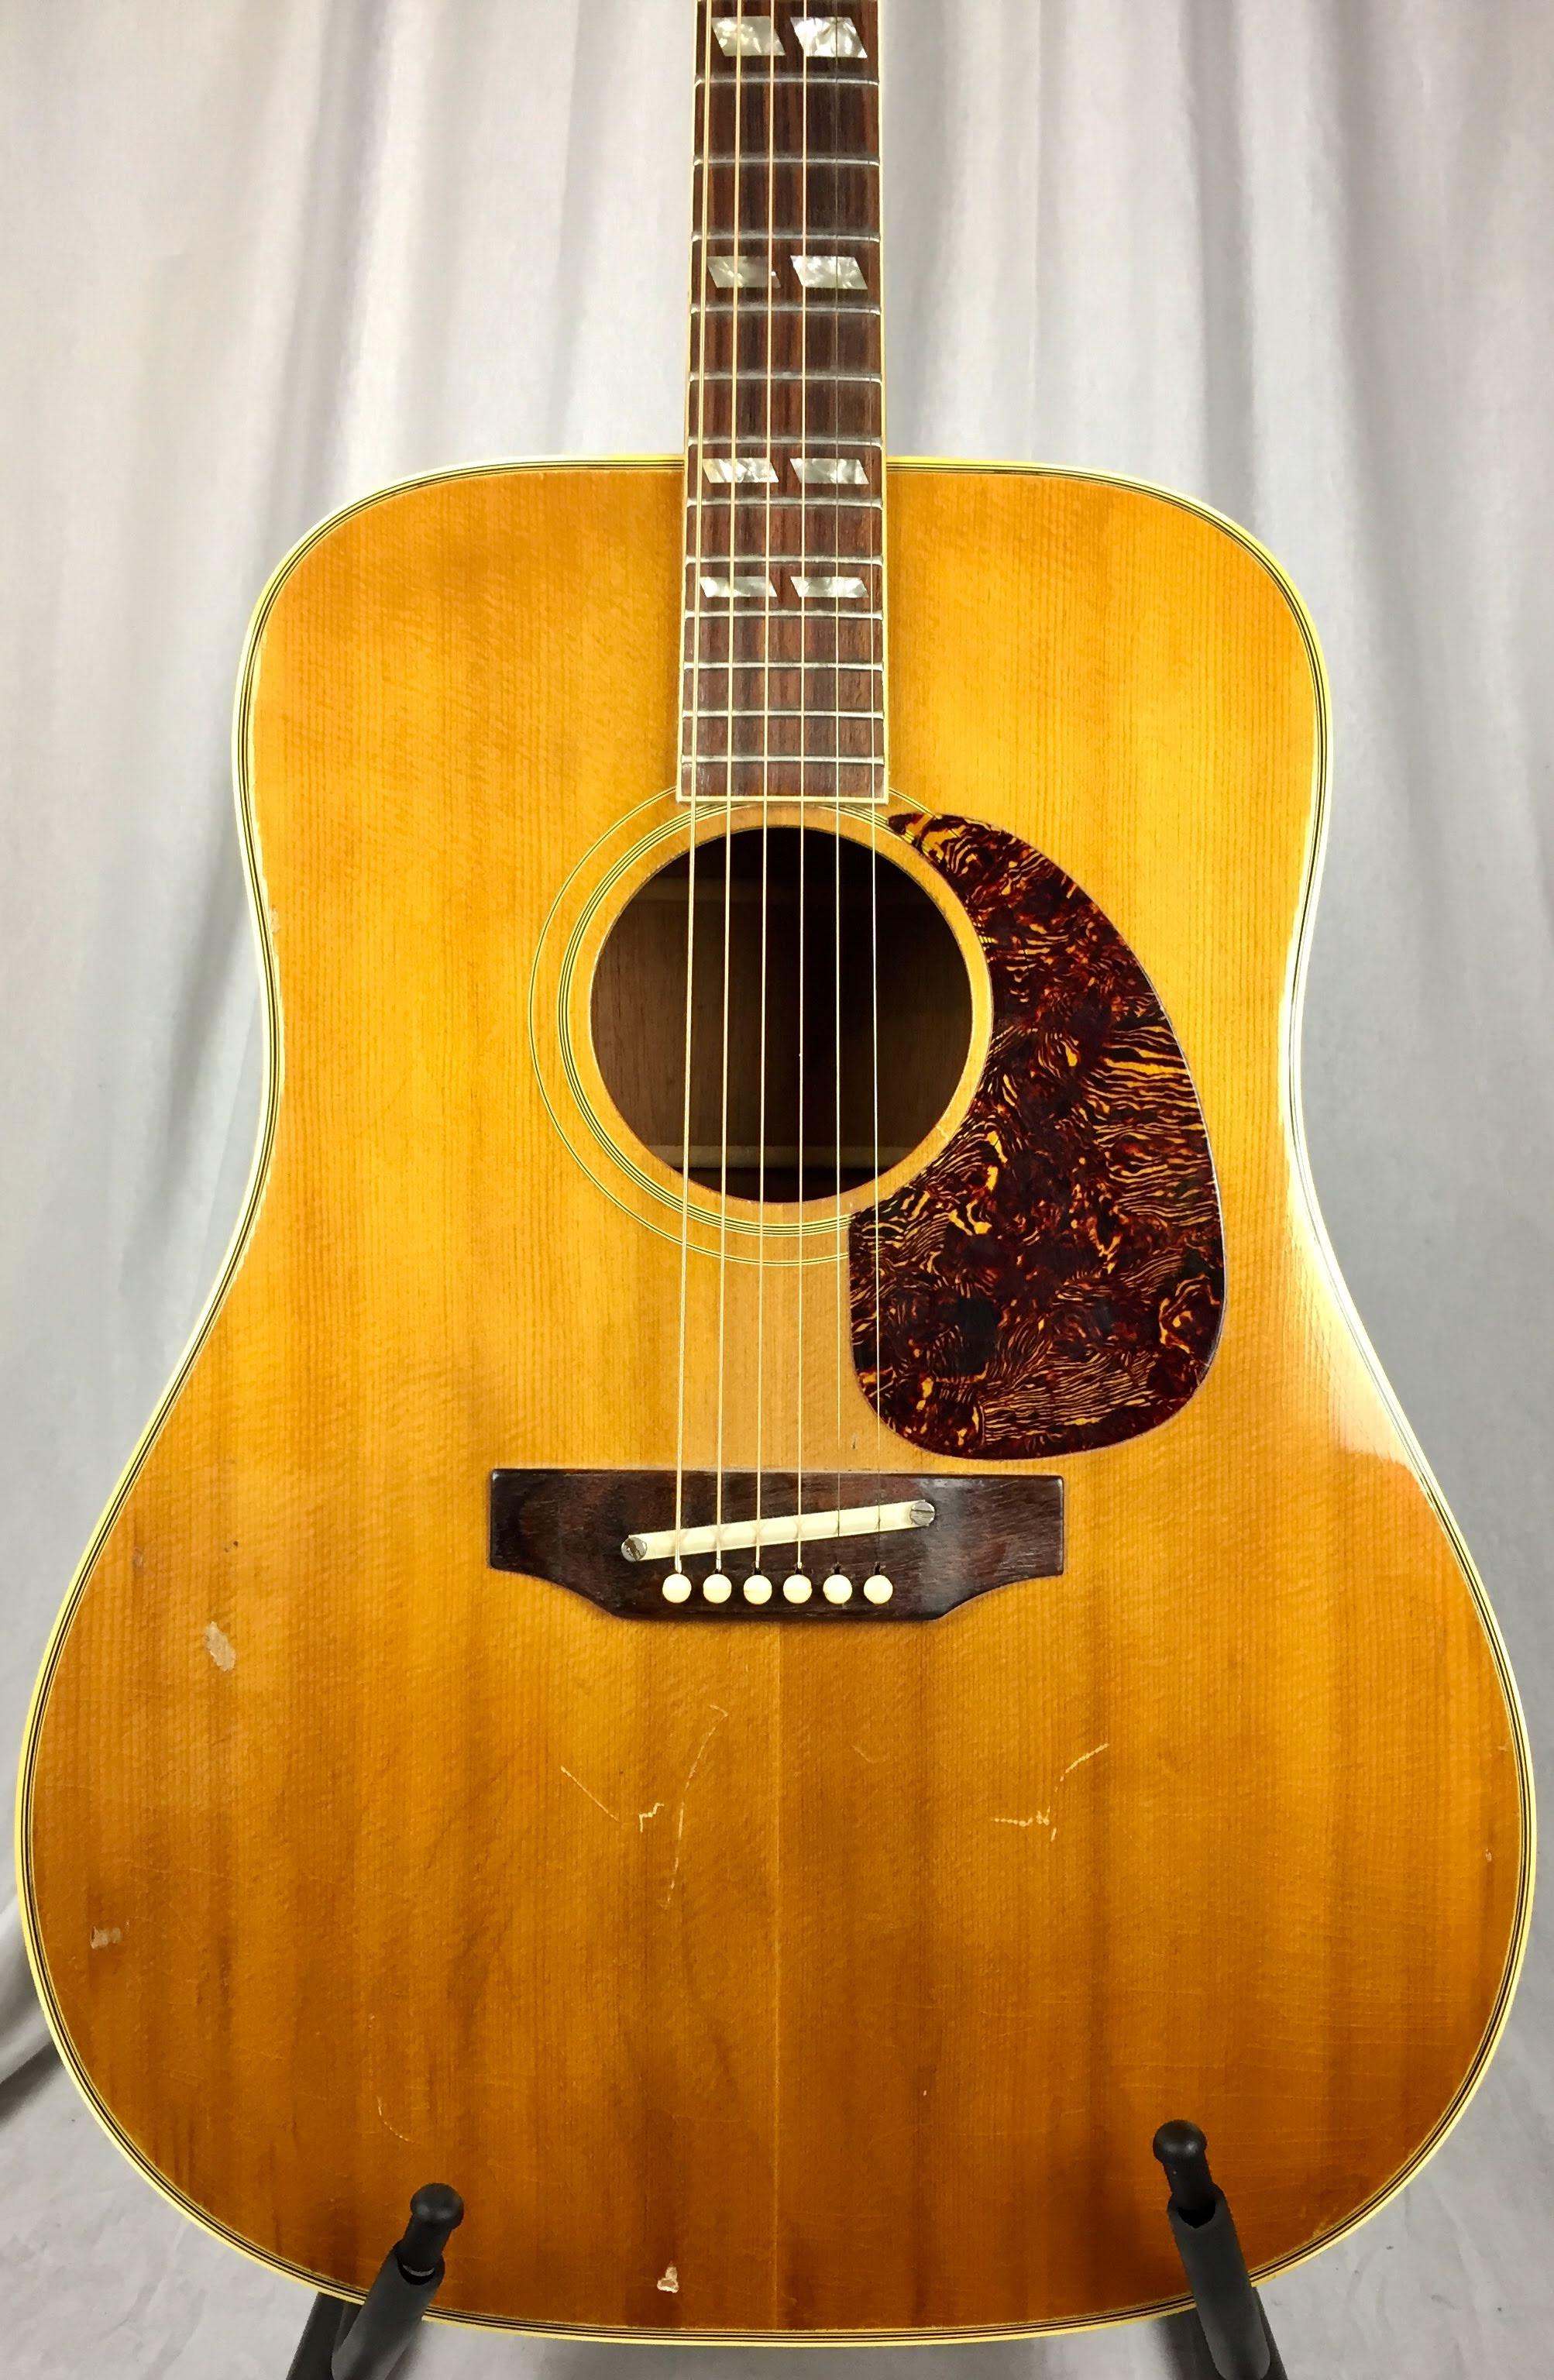 Gibson Guitars For Sale >> Vintage Guitars, SWEDEN - 1970 Gibson SJN Southern Jumbo.